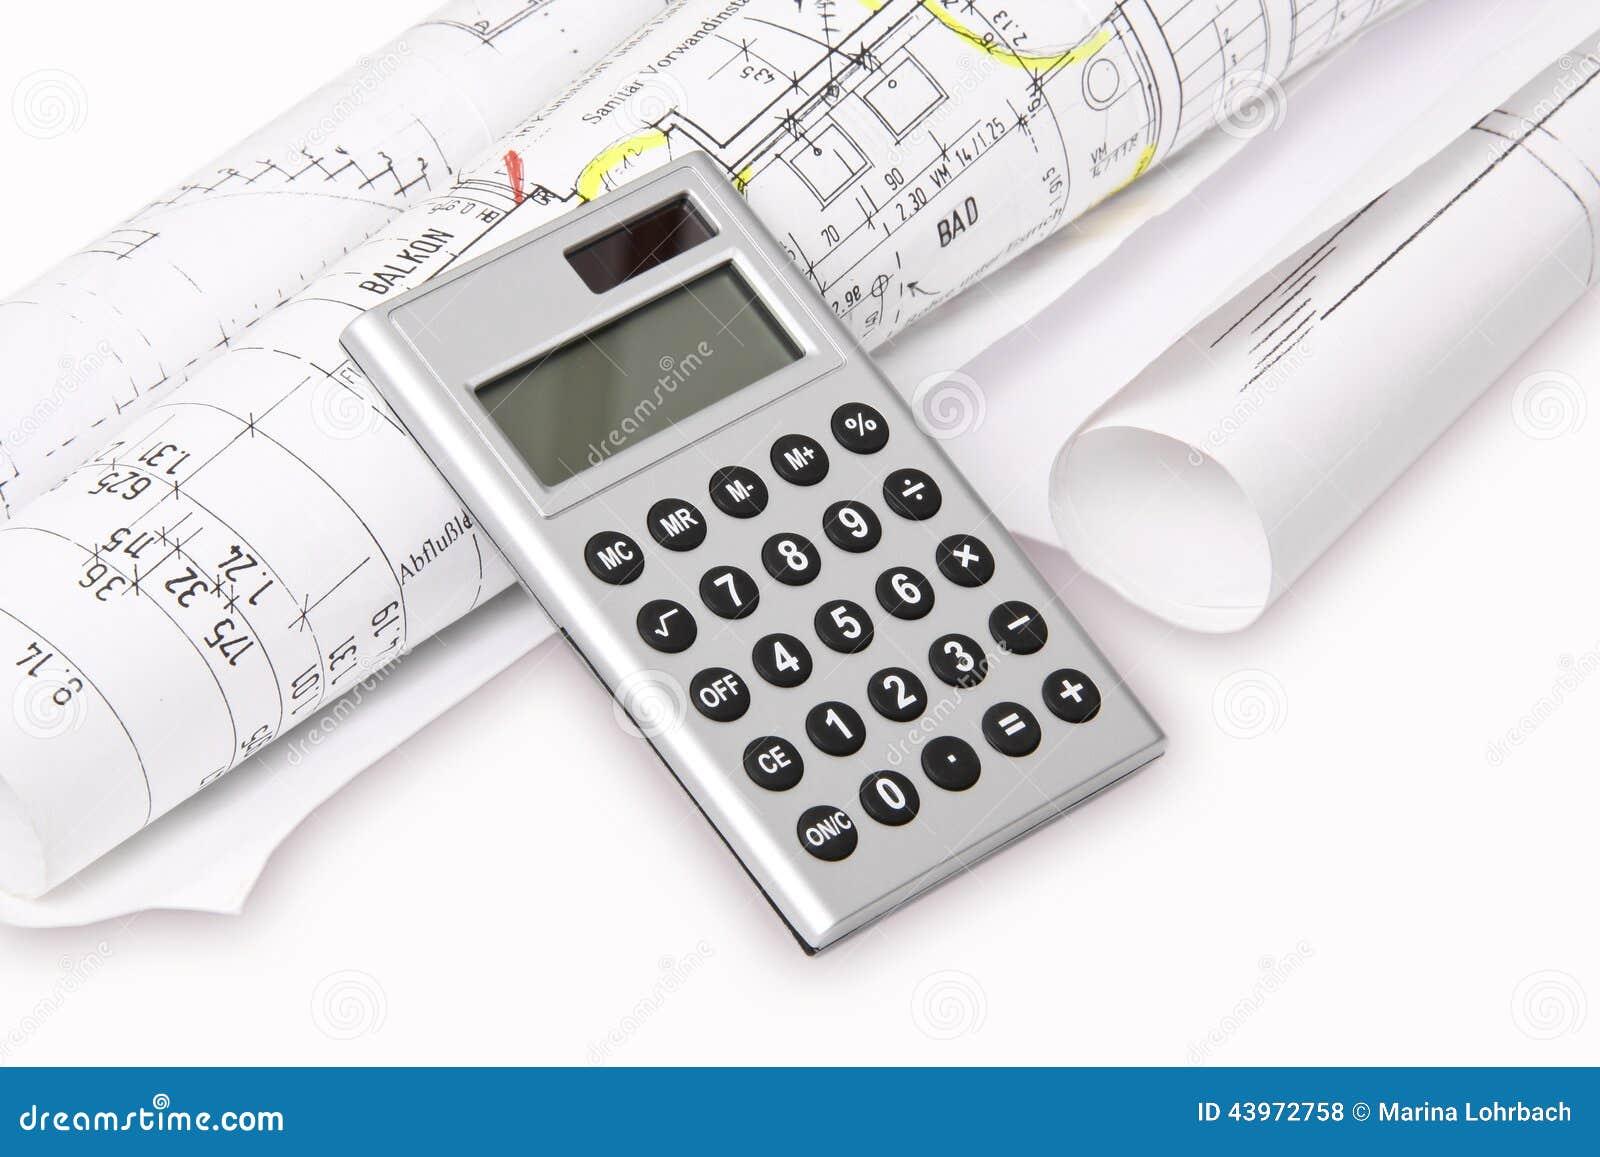 building house calculator